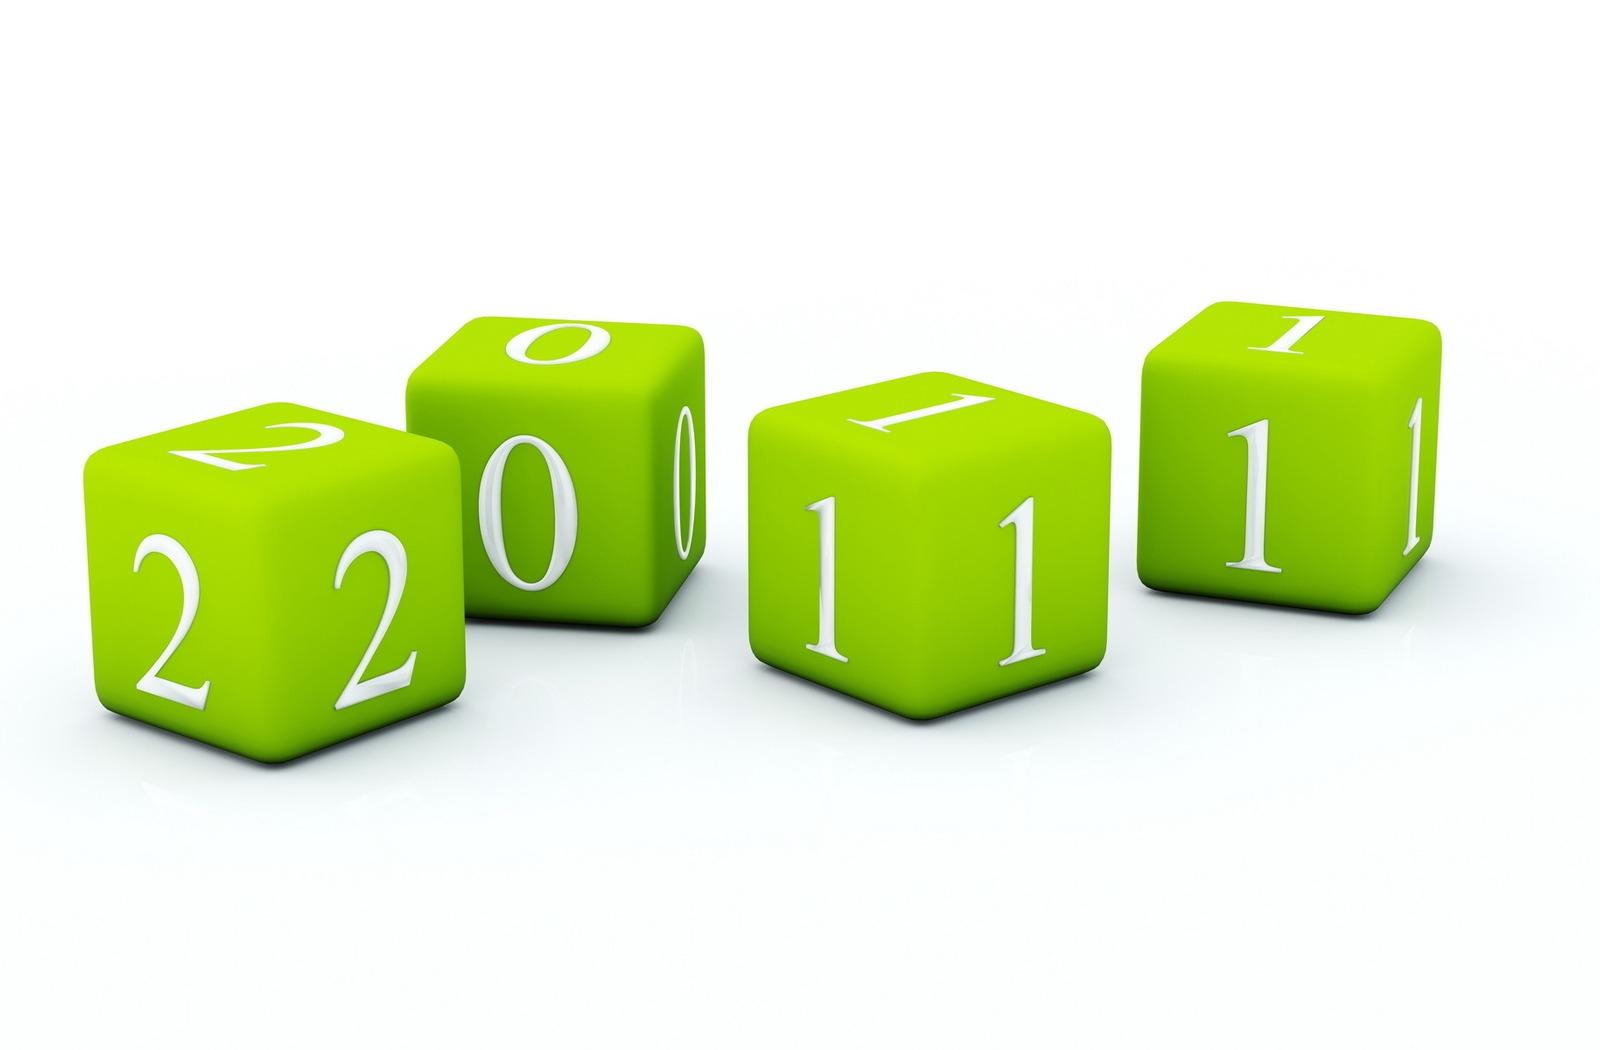 http://2.bp.blogspot.com/-BlVncXl0hoA/UF2kq-N8IdI/AAAAAAAAAH0/MlAaMmeWZGE/s1600/3d-green-dice-White-wallpaper.jpg